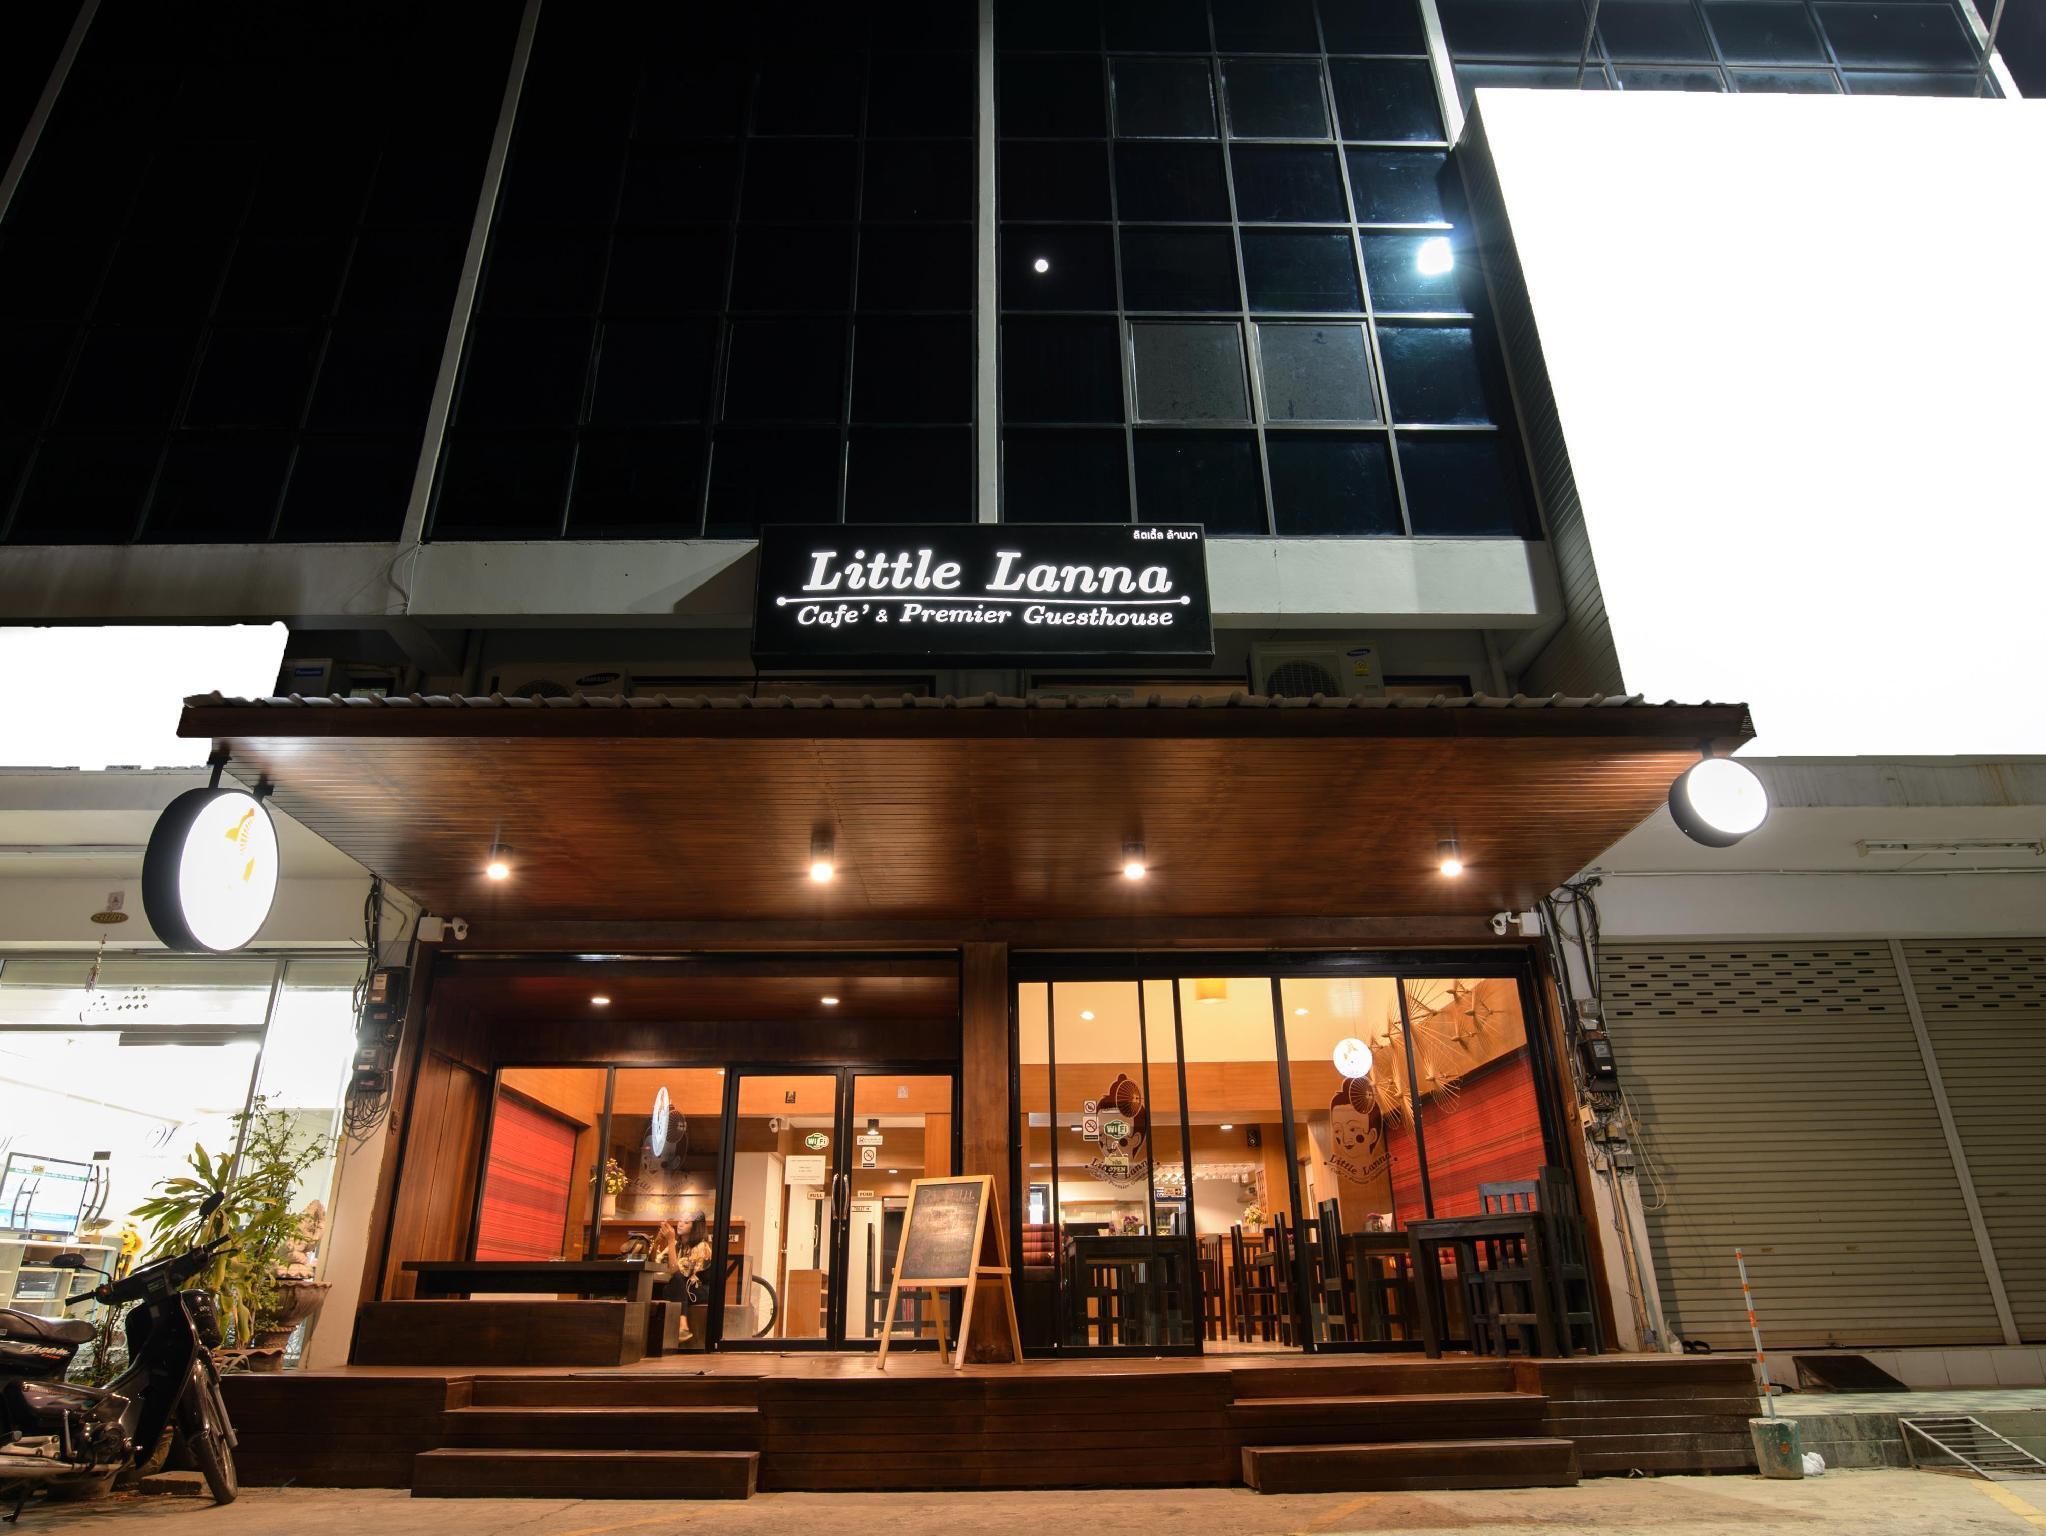 Little Lanna Cafe and Premier Guesthouse ลิตเติ้ล ล้านนา คาเฟ่ แอนด์ พรีเมียร์ เกสเฮ้าส์